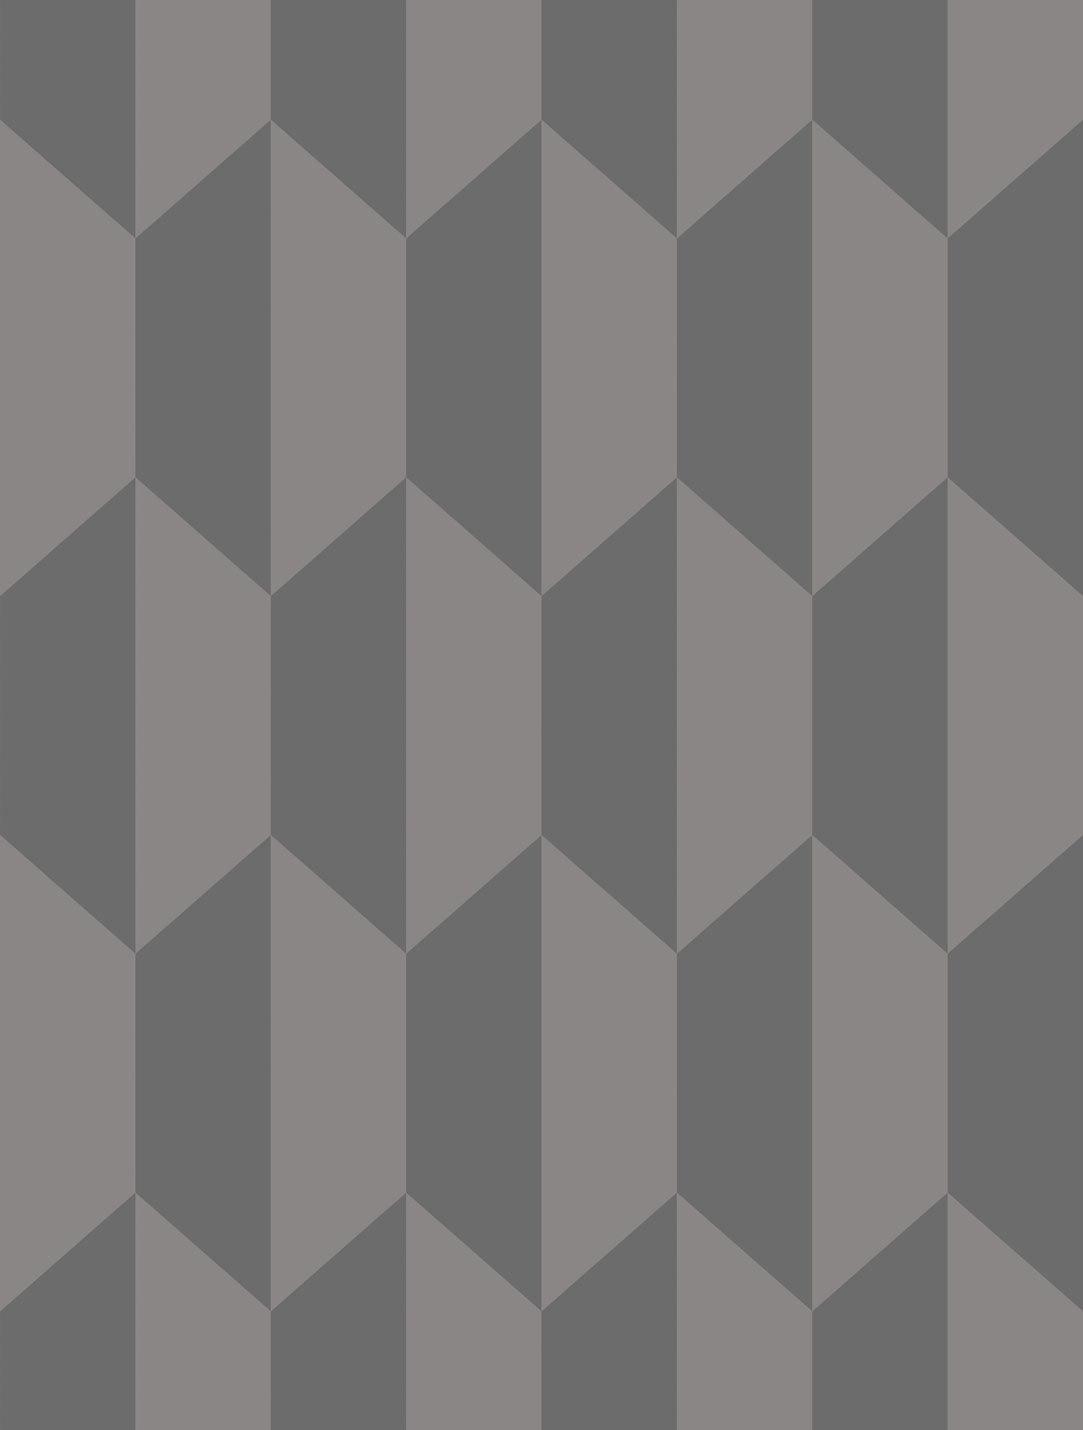 Обои Cole & Son Geometric II 105/12051, интернет магазин Волео